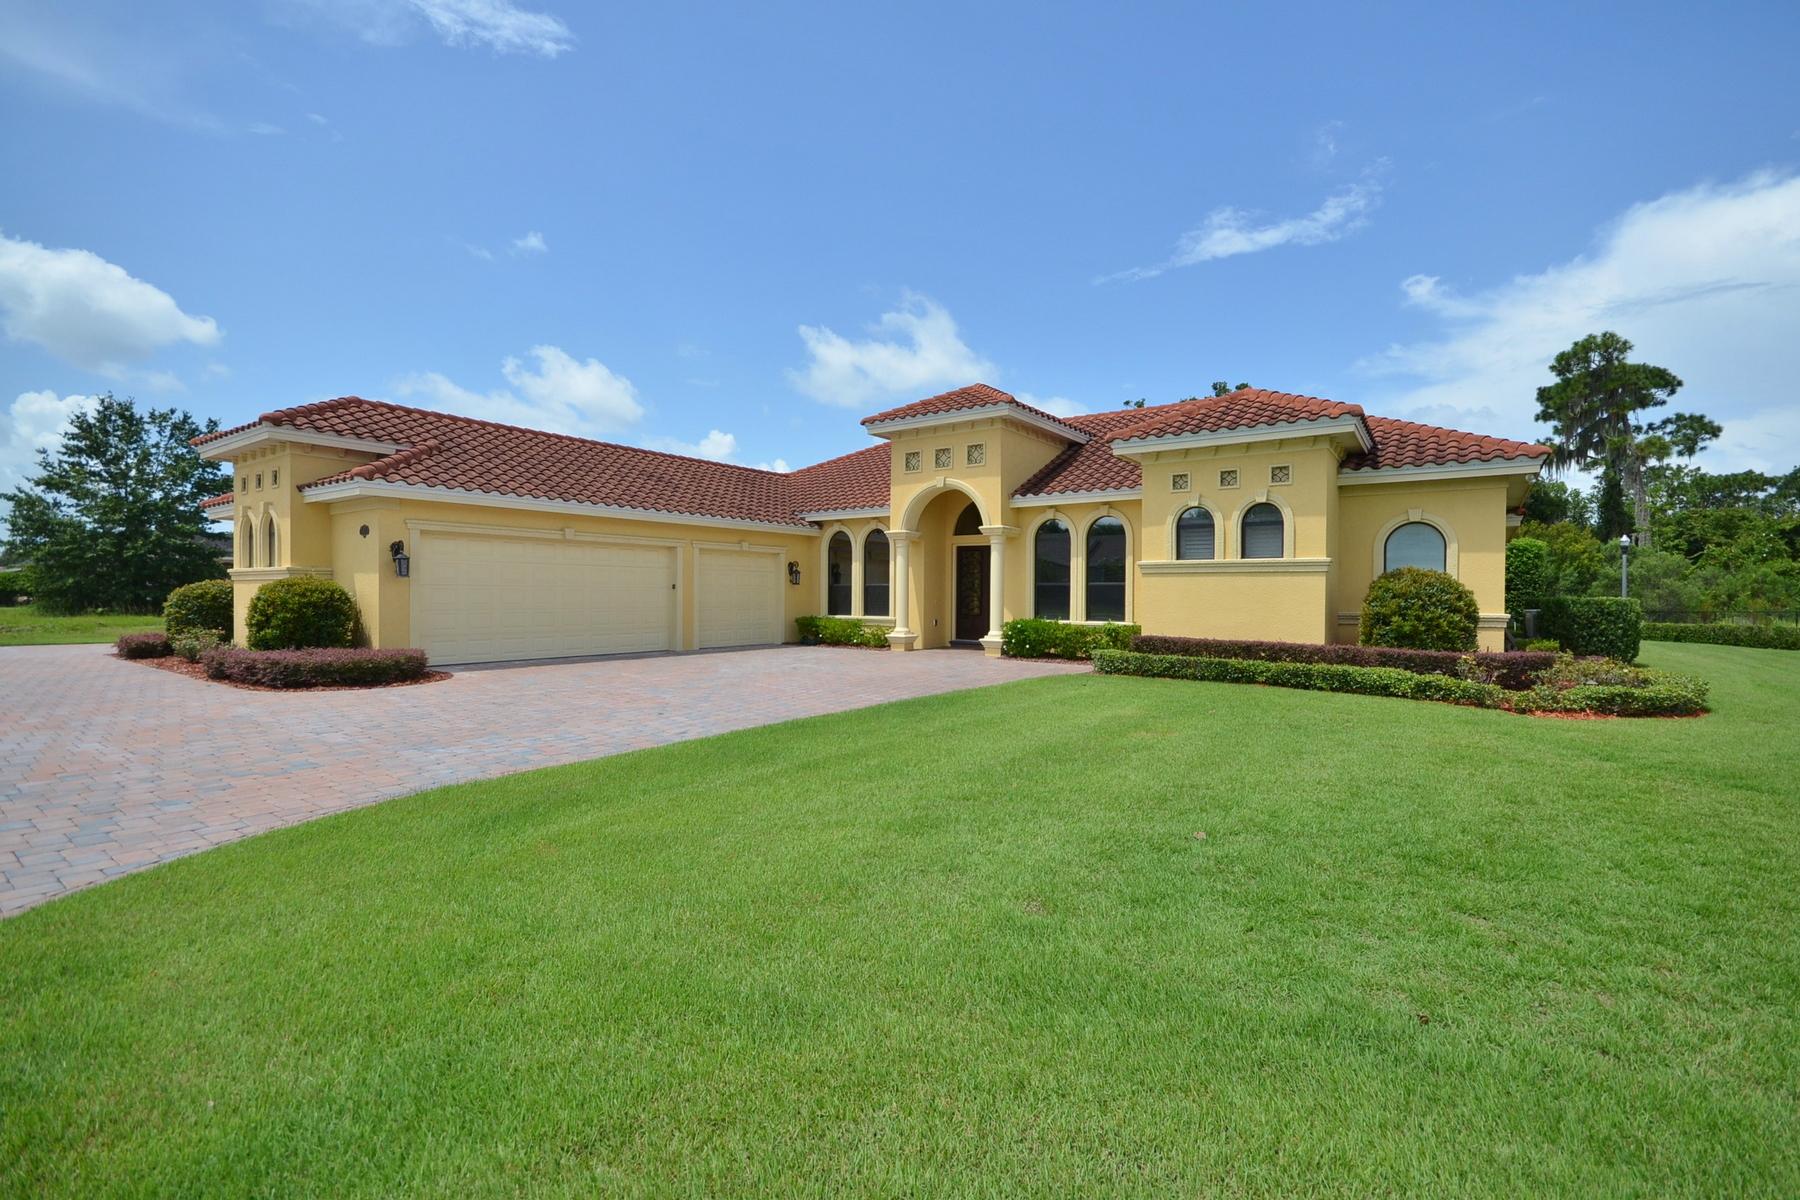 Property For Sale at Lakeland, Florida